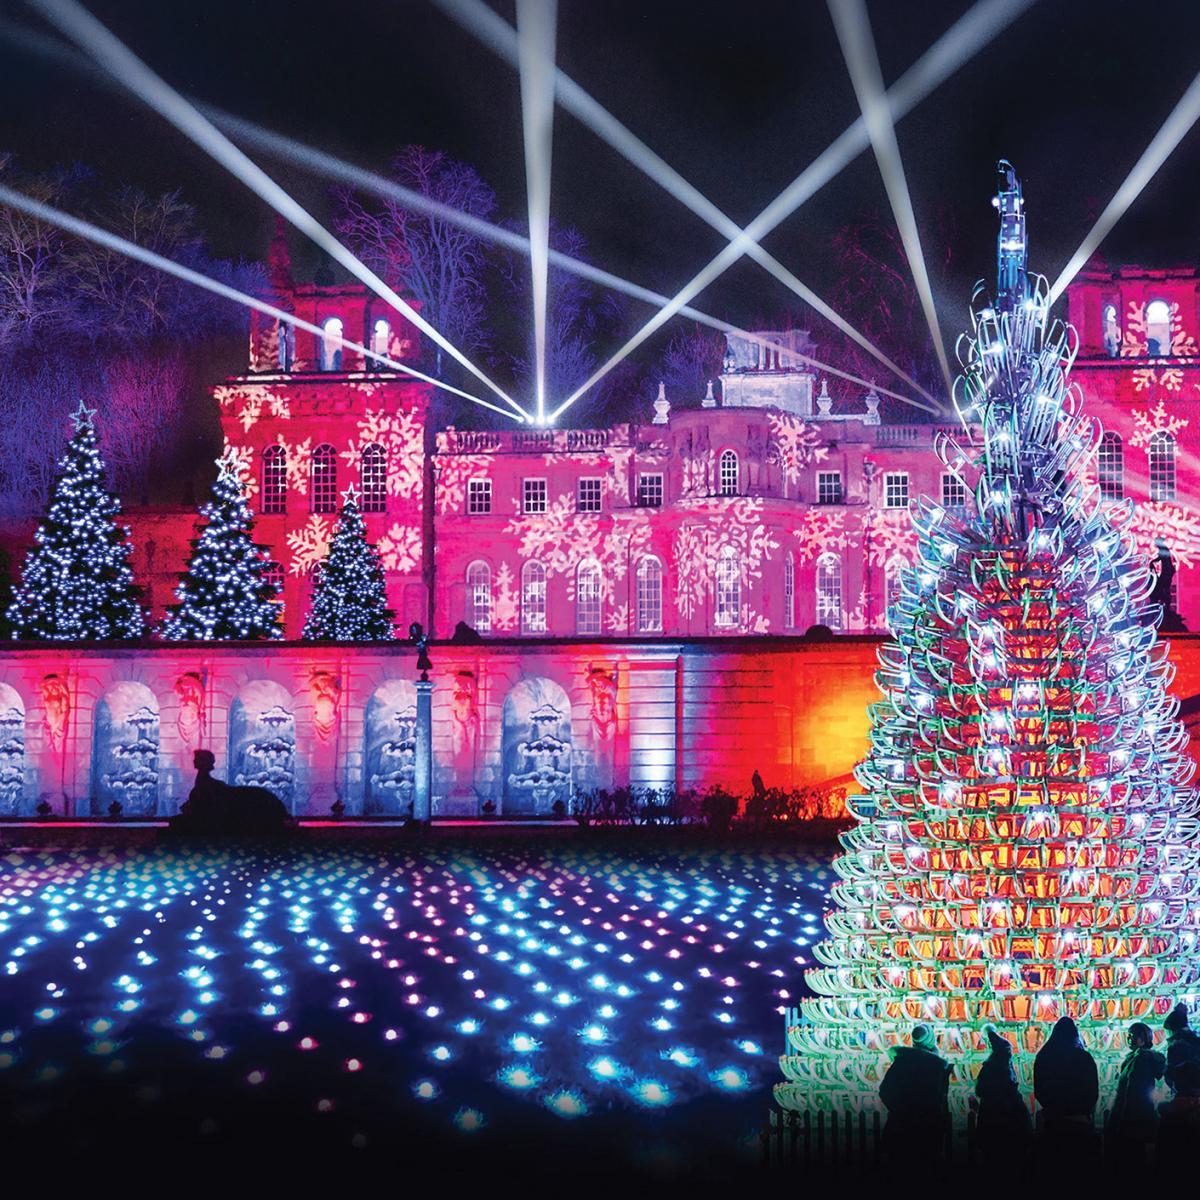 Blenheim Palace Illuminated Christmas Lights Trail 2019